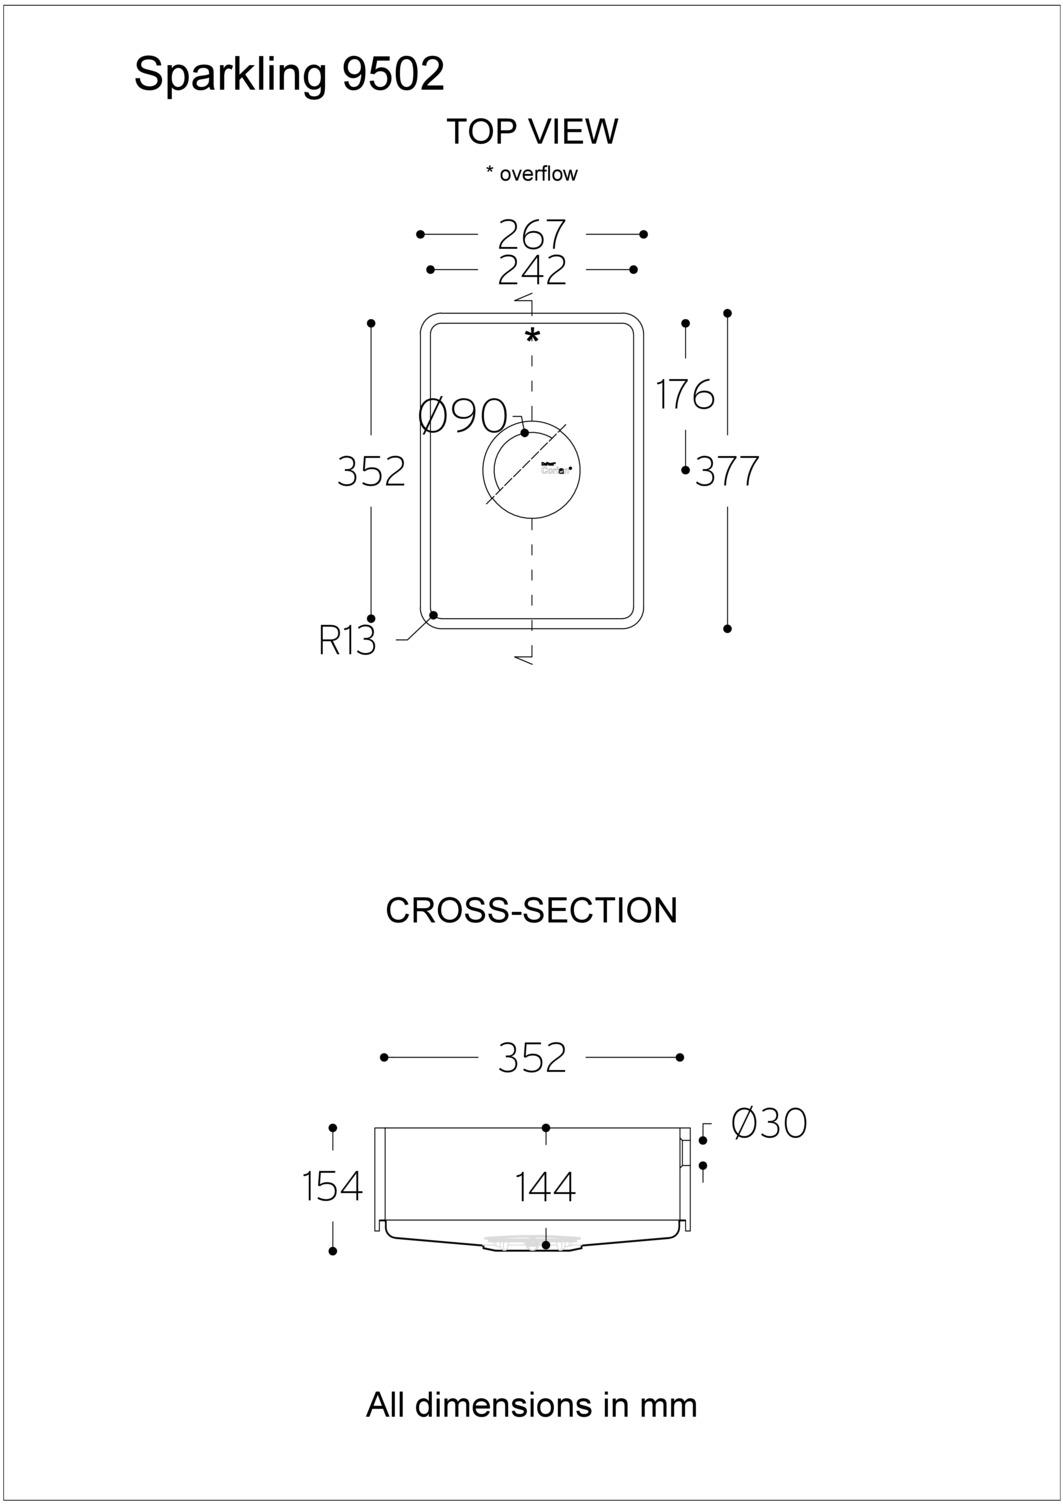 DUPONT_CORIAN_SPARKLING9502_2D_PDF[0]